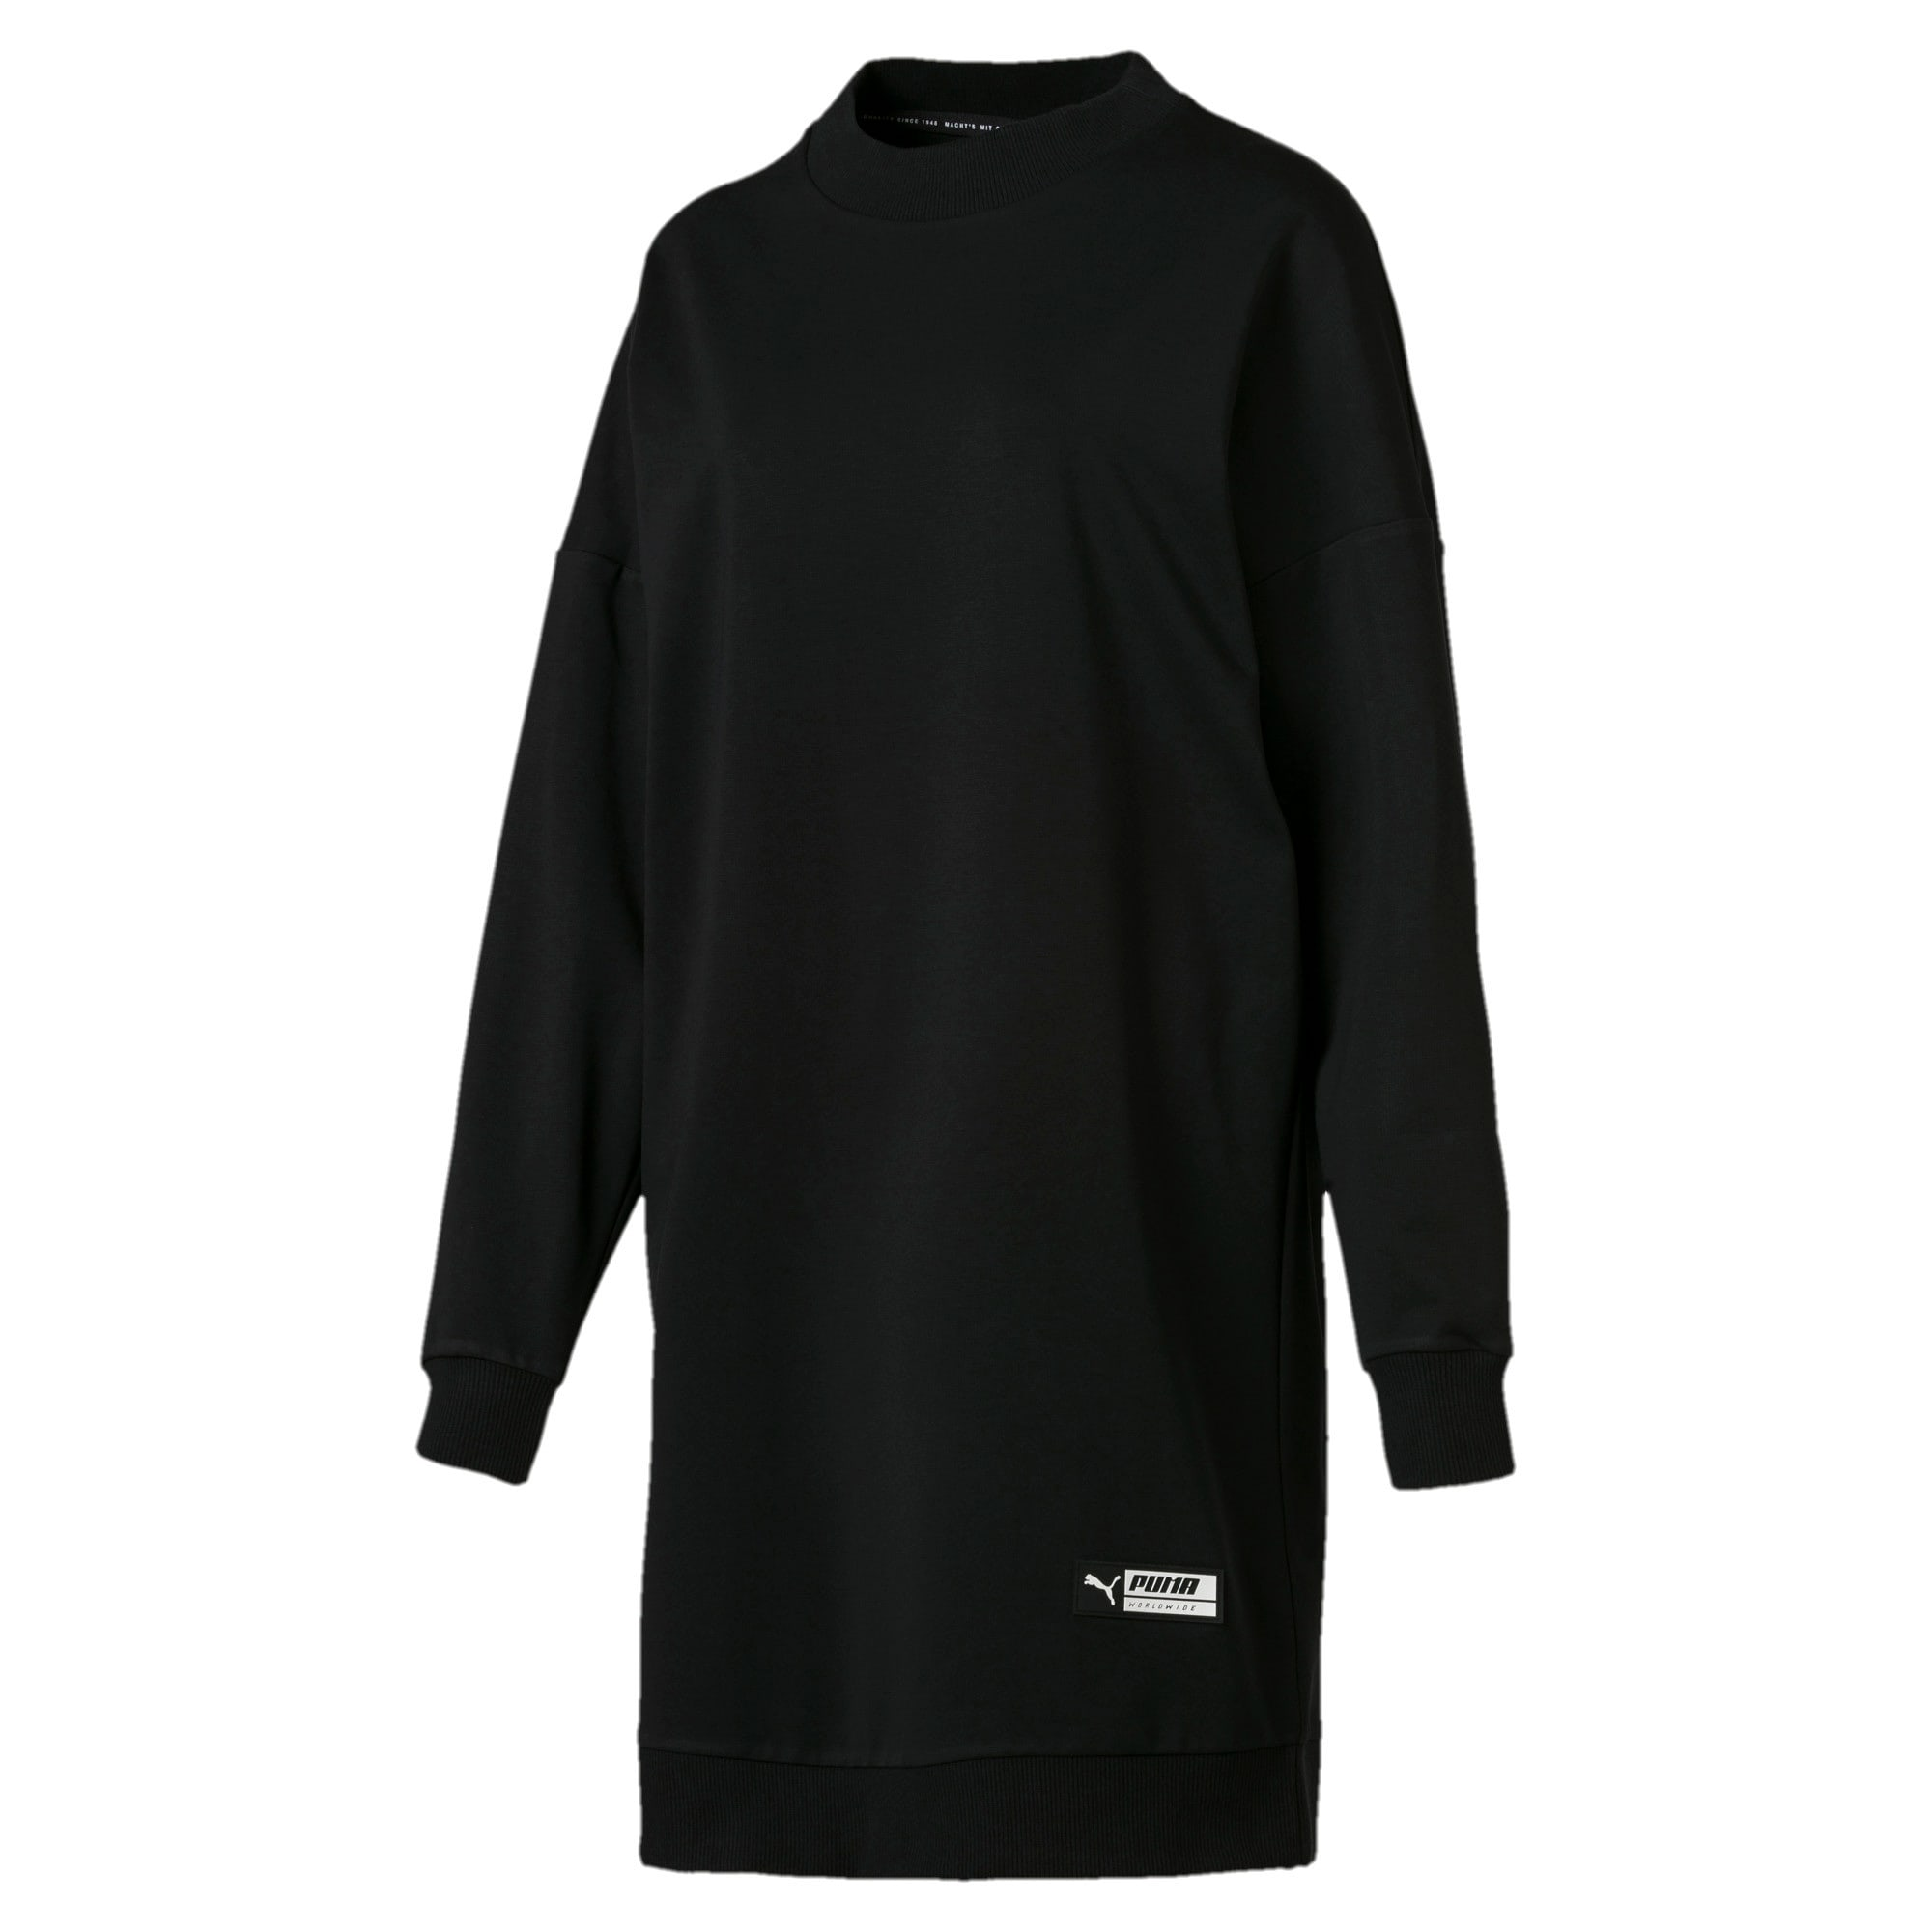 Thumbnail 4 of Trailblazer Women's Long Crewneck Sweatshirt, Cotton Black, medium